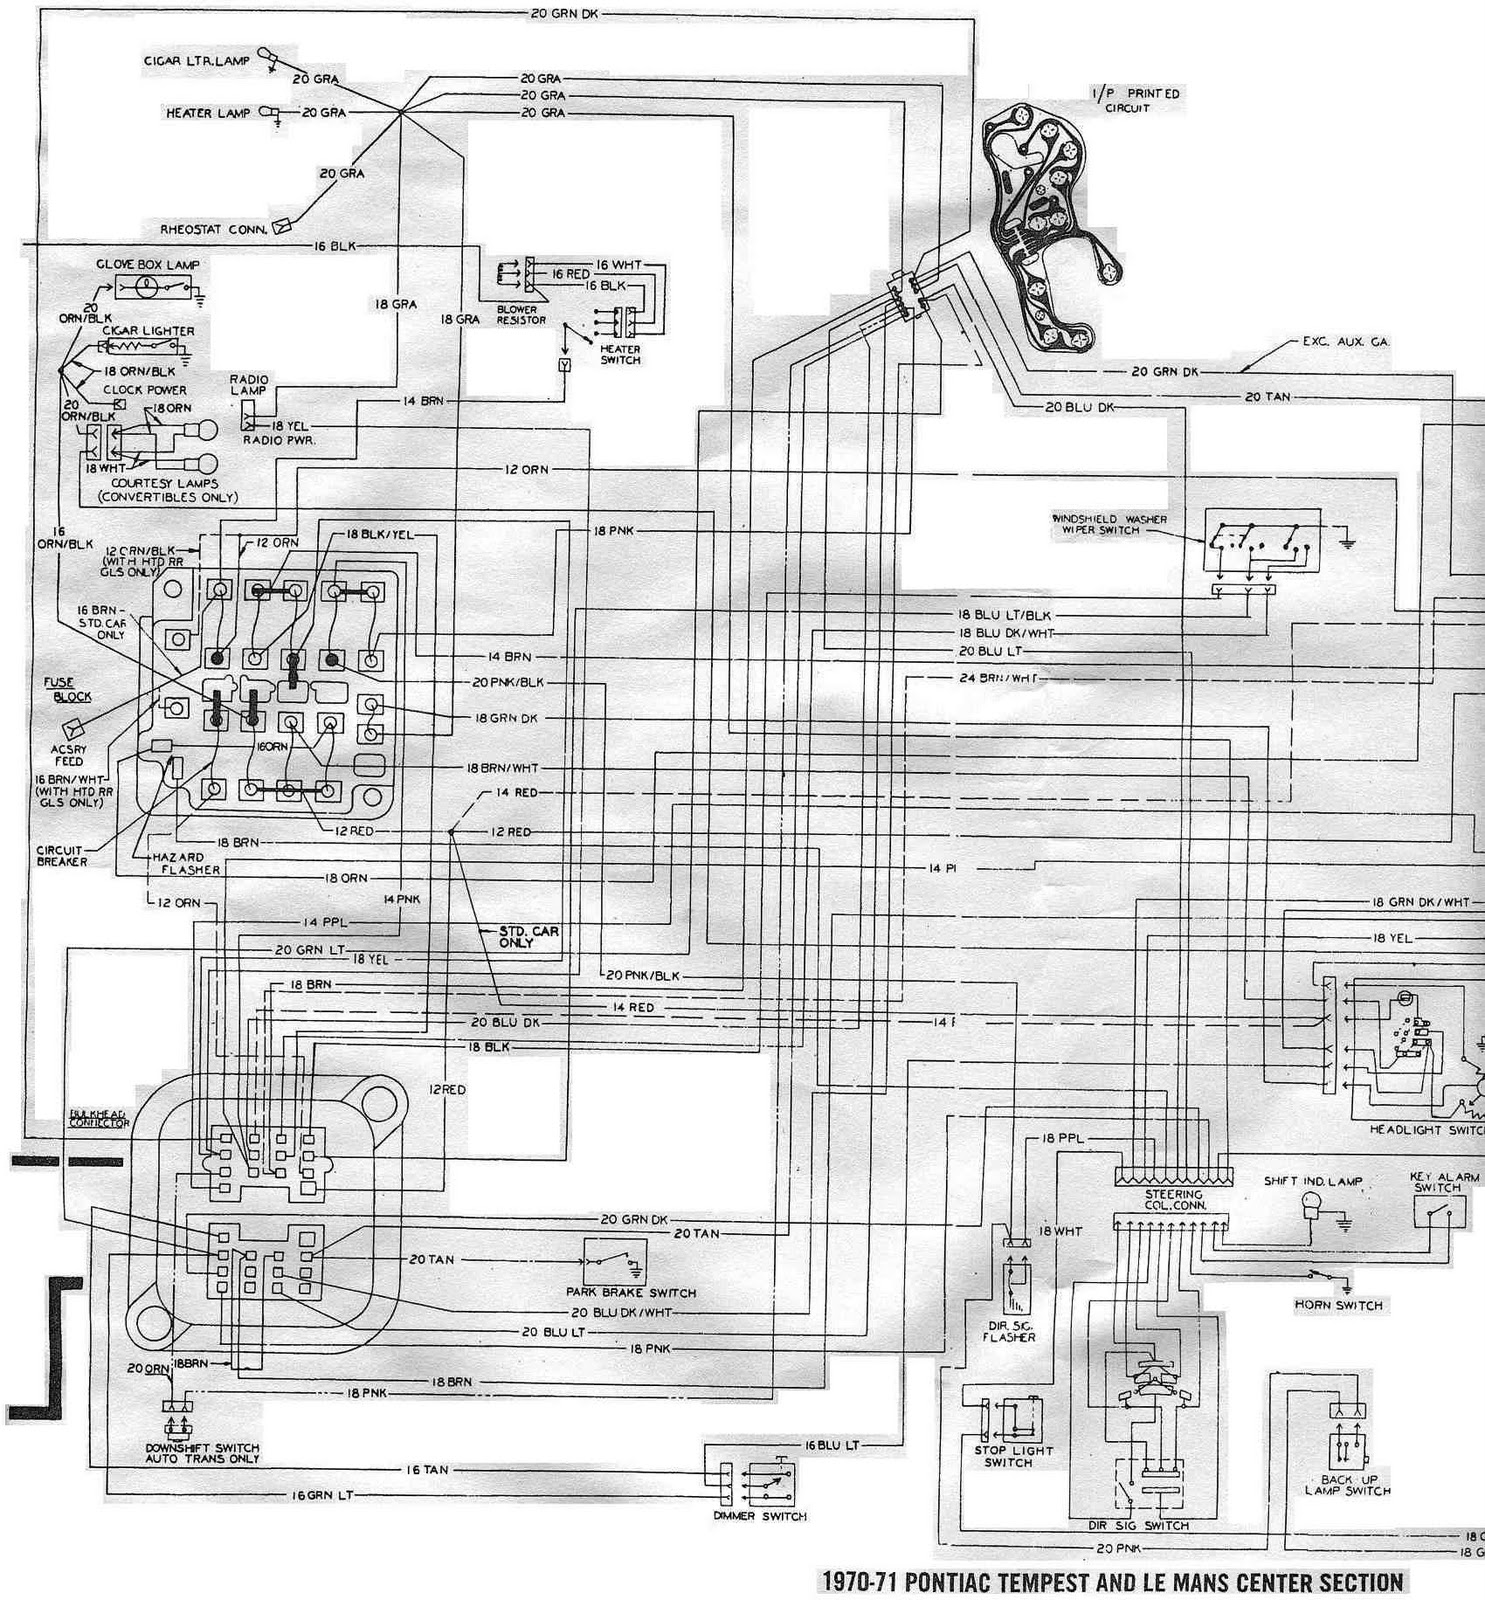 67 gto engine wiring diagram, 1967 pontiac gto vacuum diagram, 1967 dodge  a100 wiring